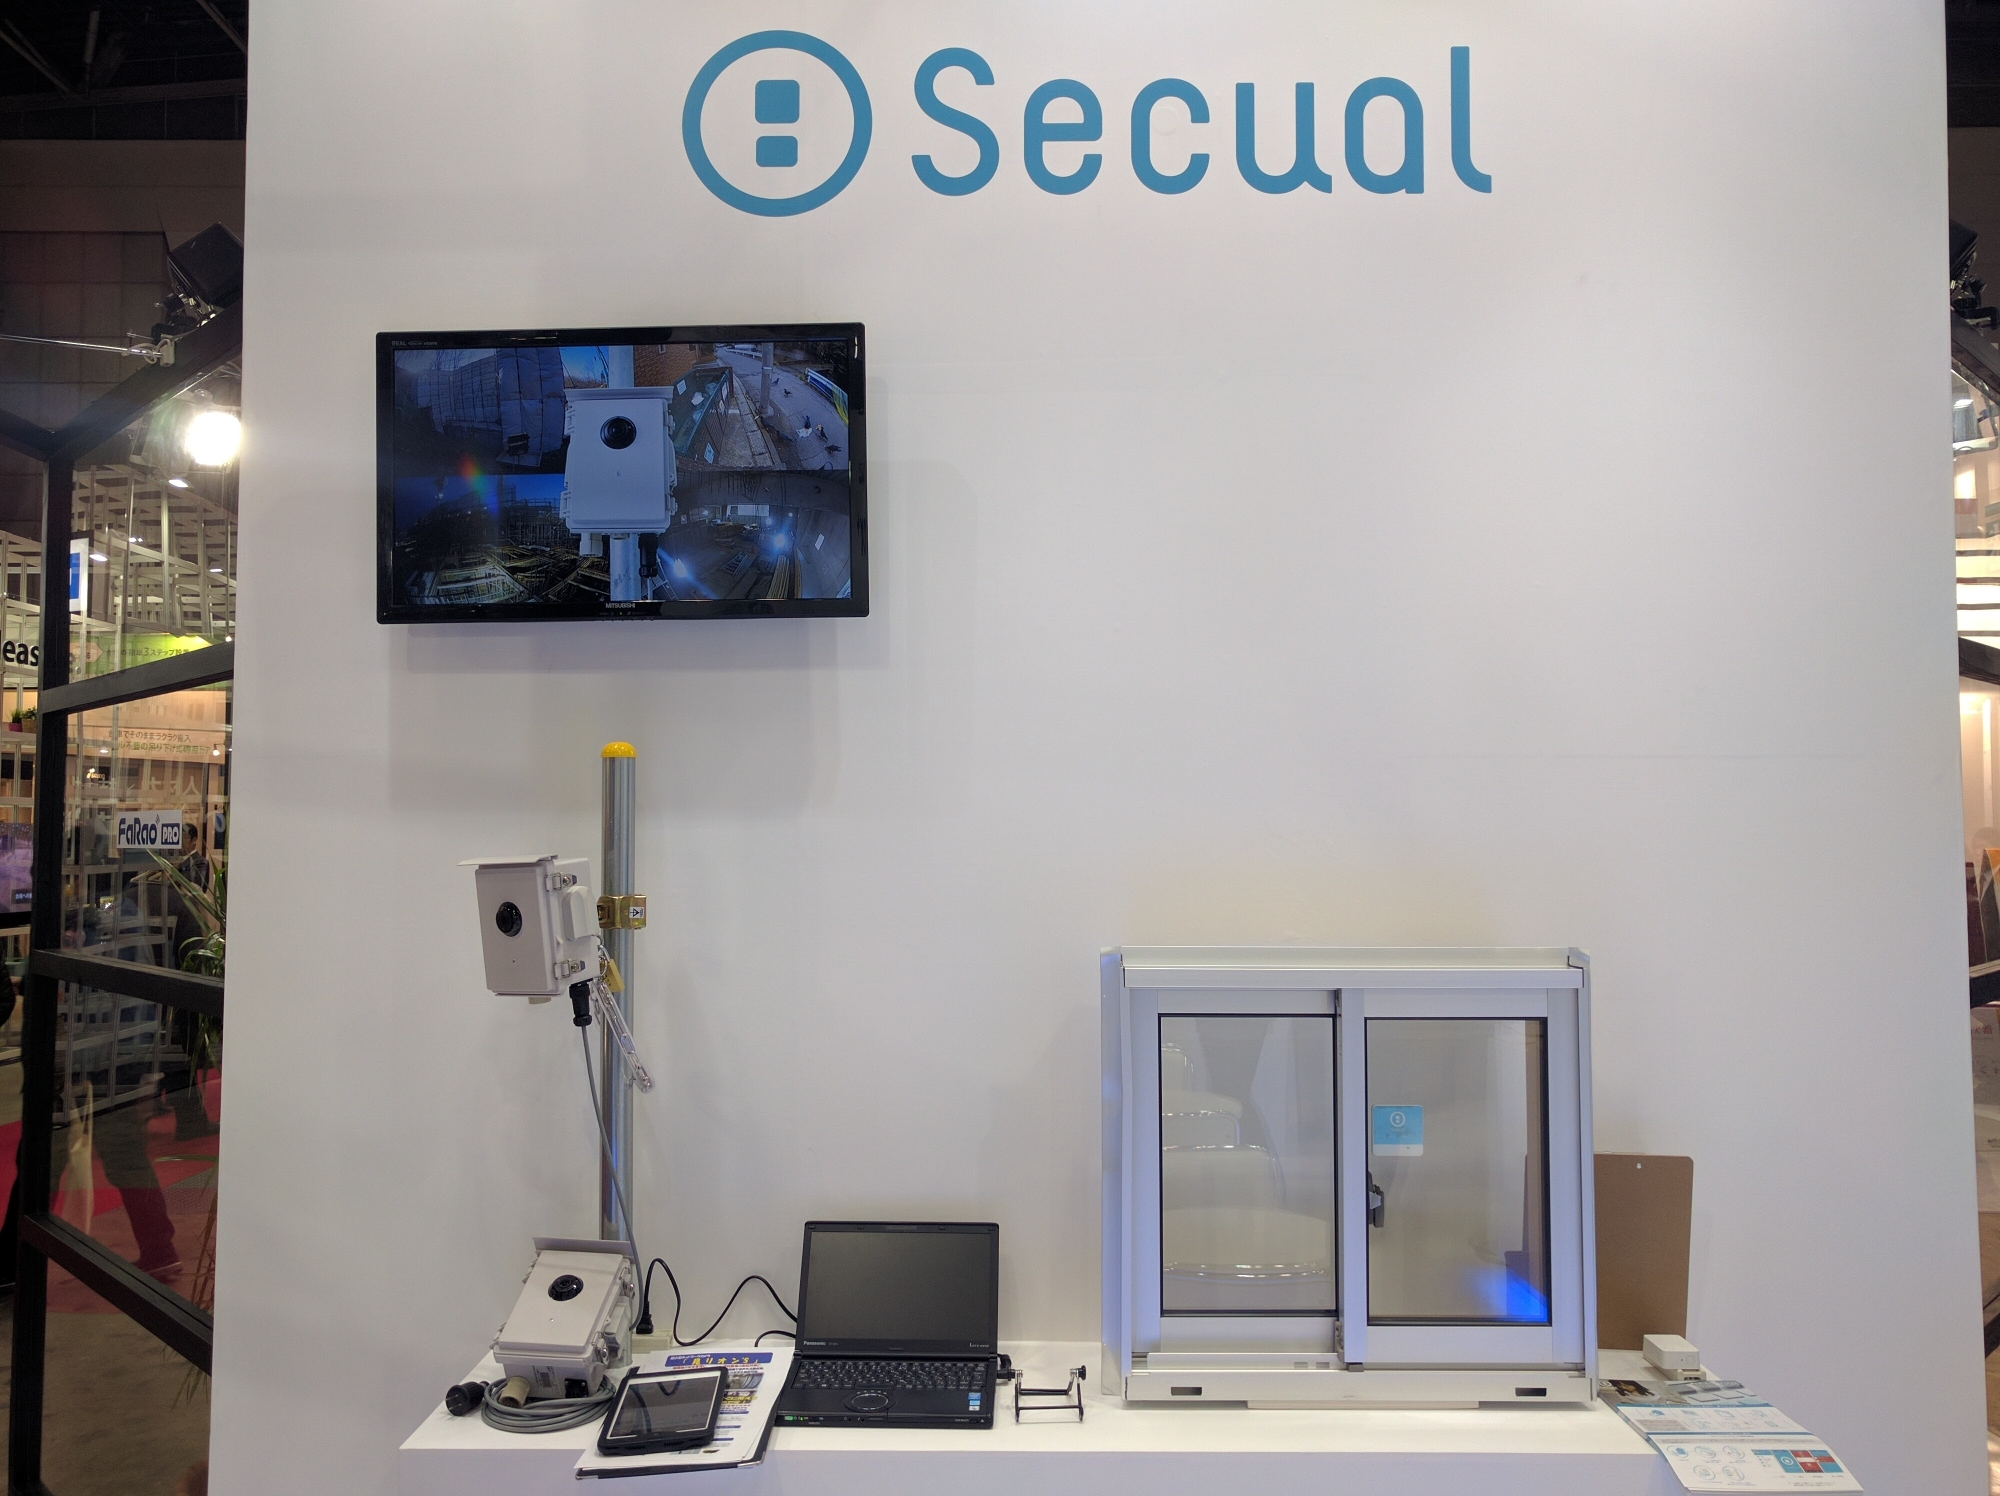 Secualブース、機器展示の様子